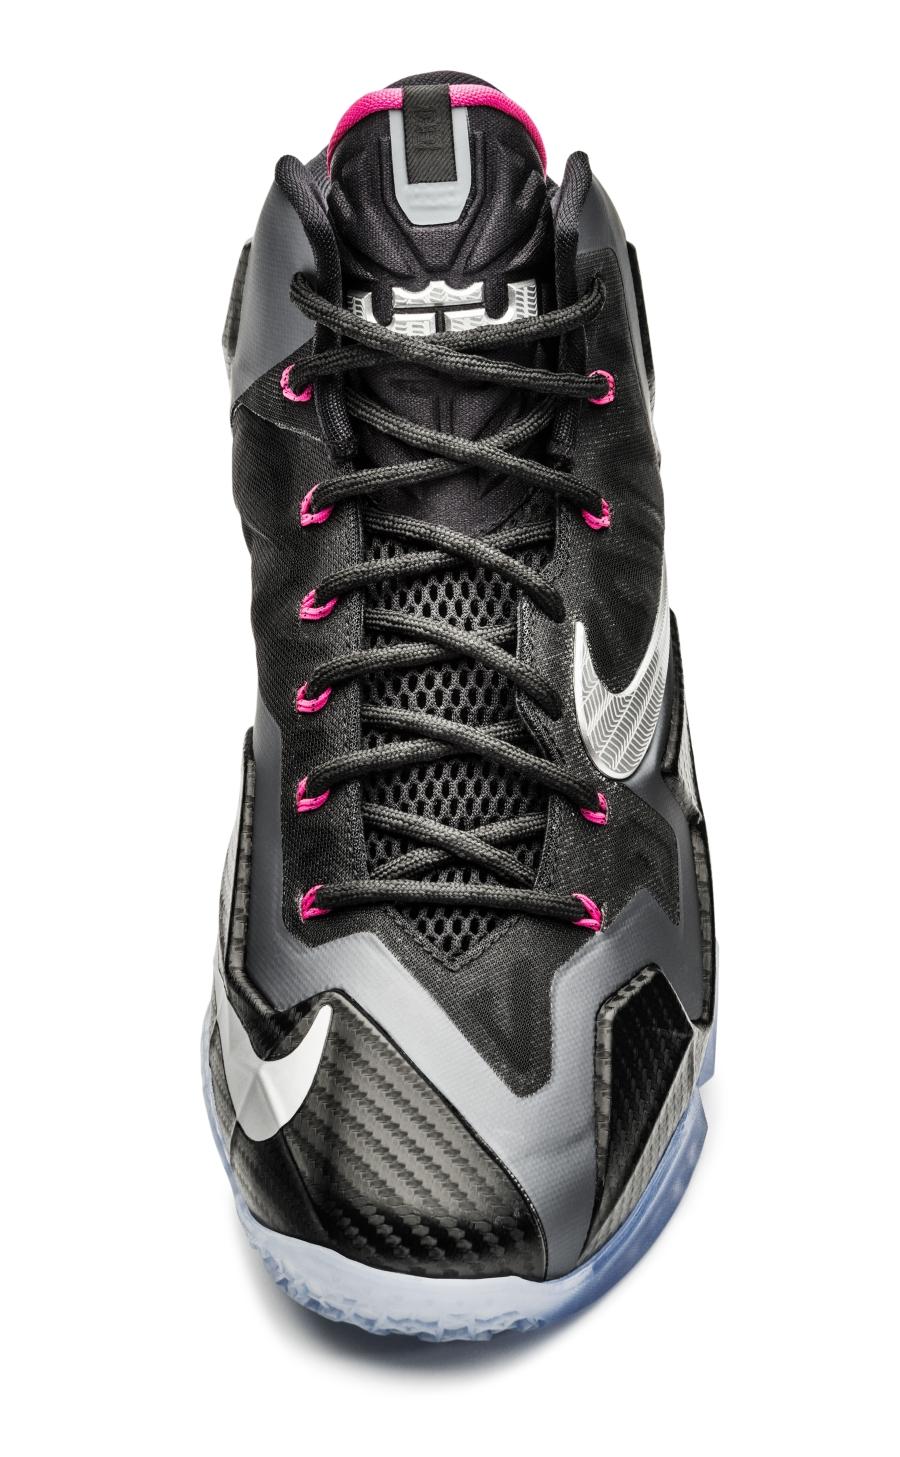 best sneakers 9aff9 19bcf Nike LeBron 11